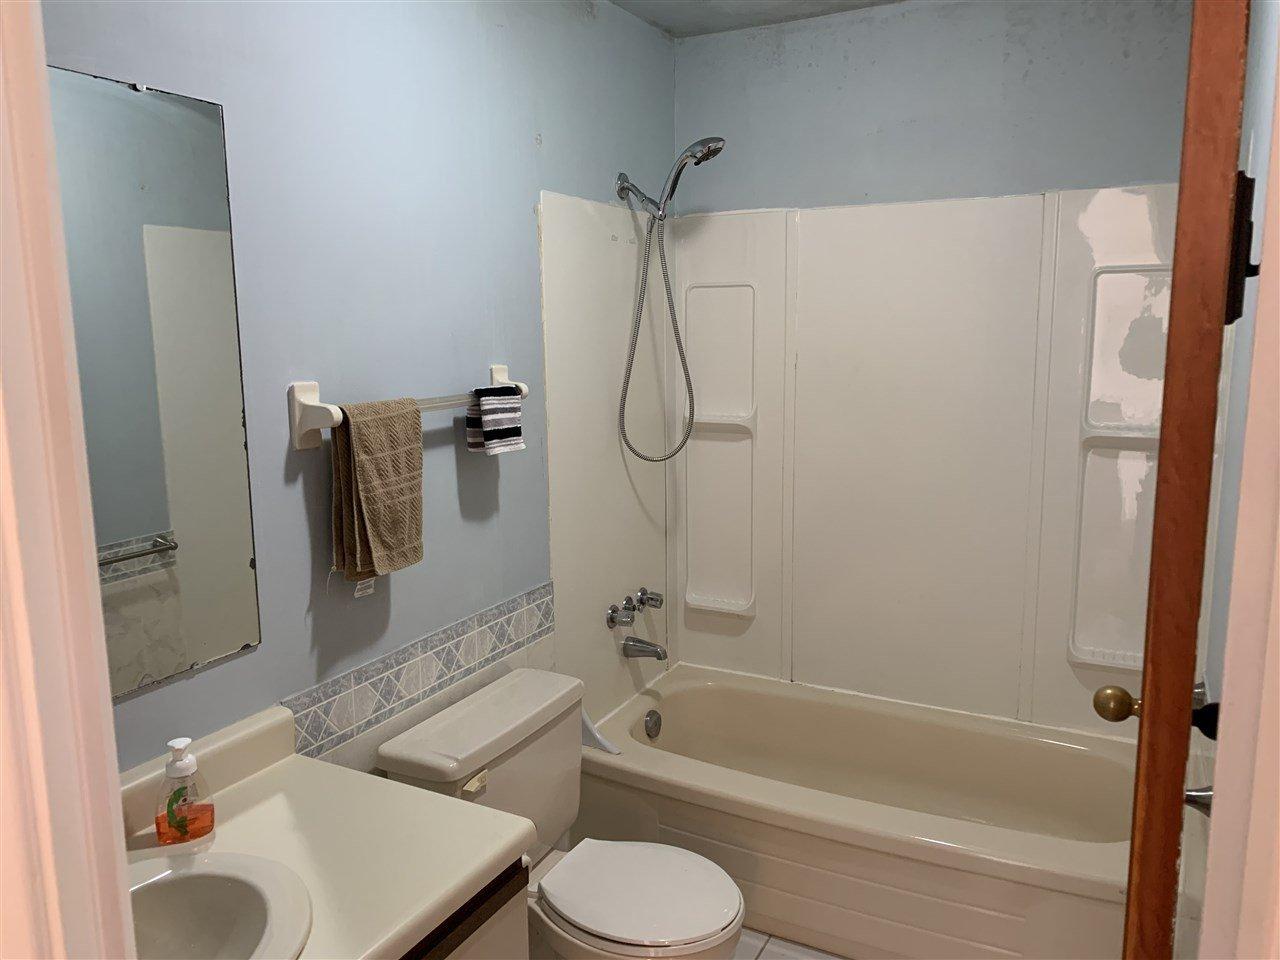 Photo 4: Photos: 8 Emily Court in Lower Sackville: 25-Sackville Residential for sale (Halifax-Dartmouth)  : MLS®# 202008626